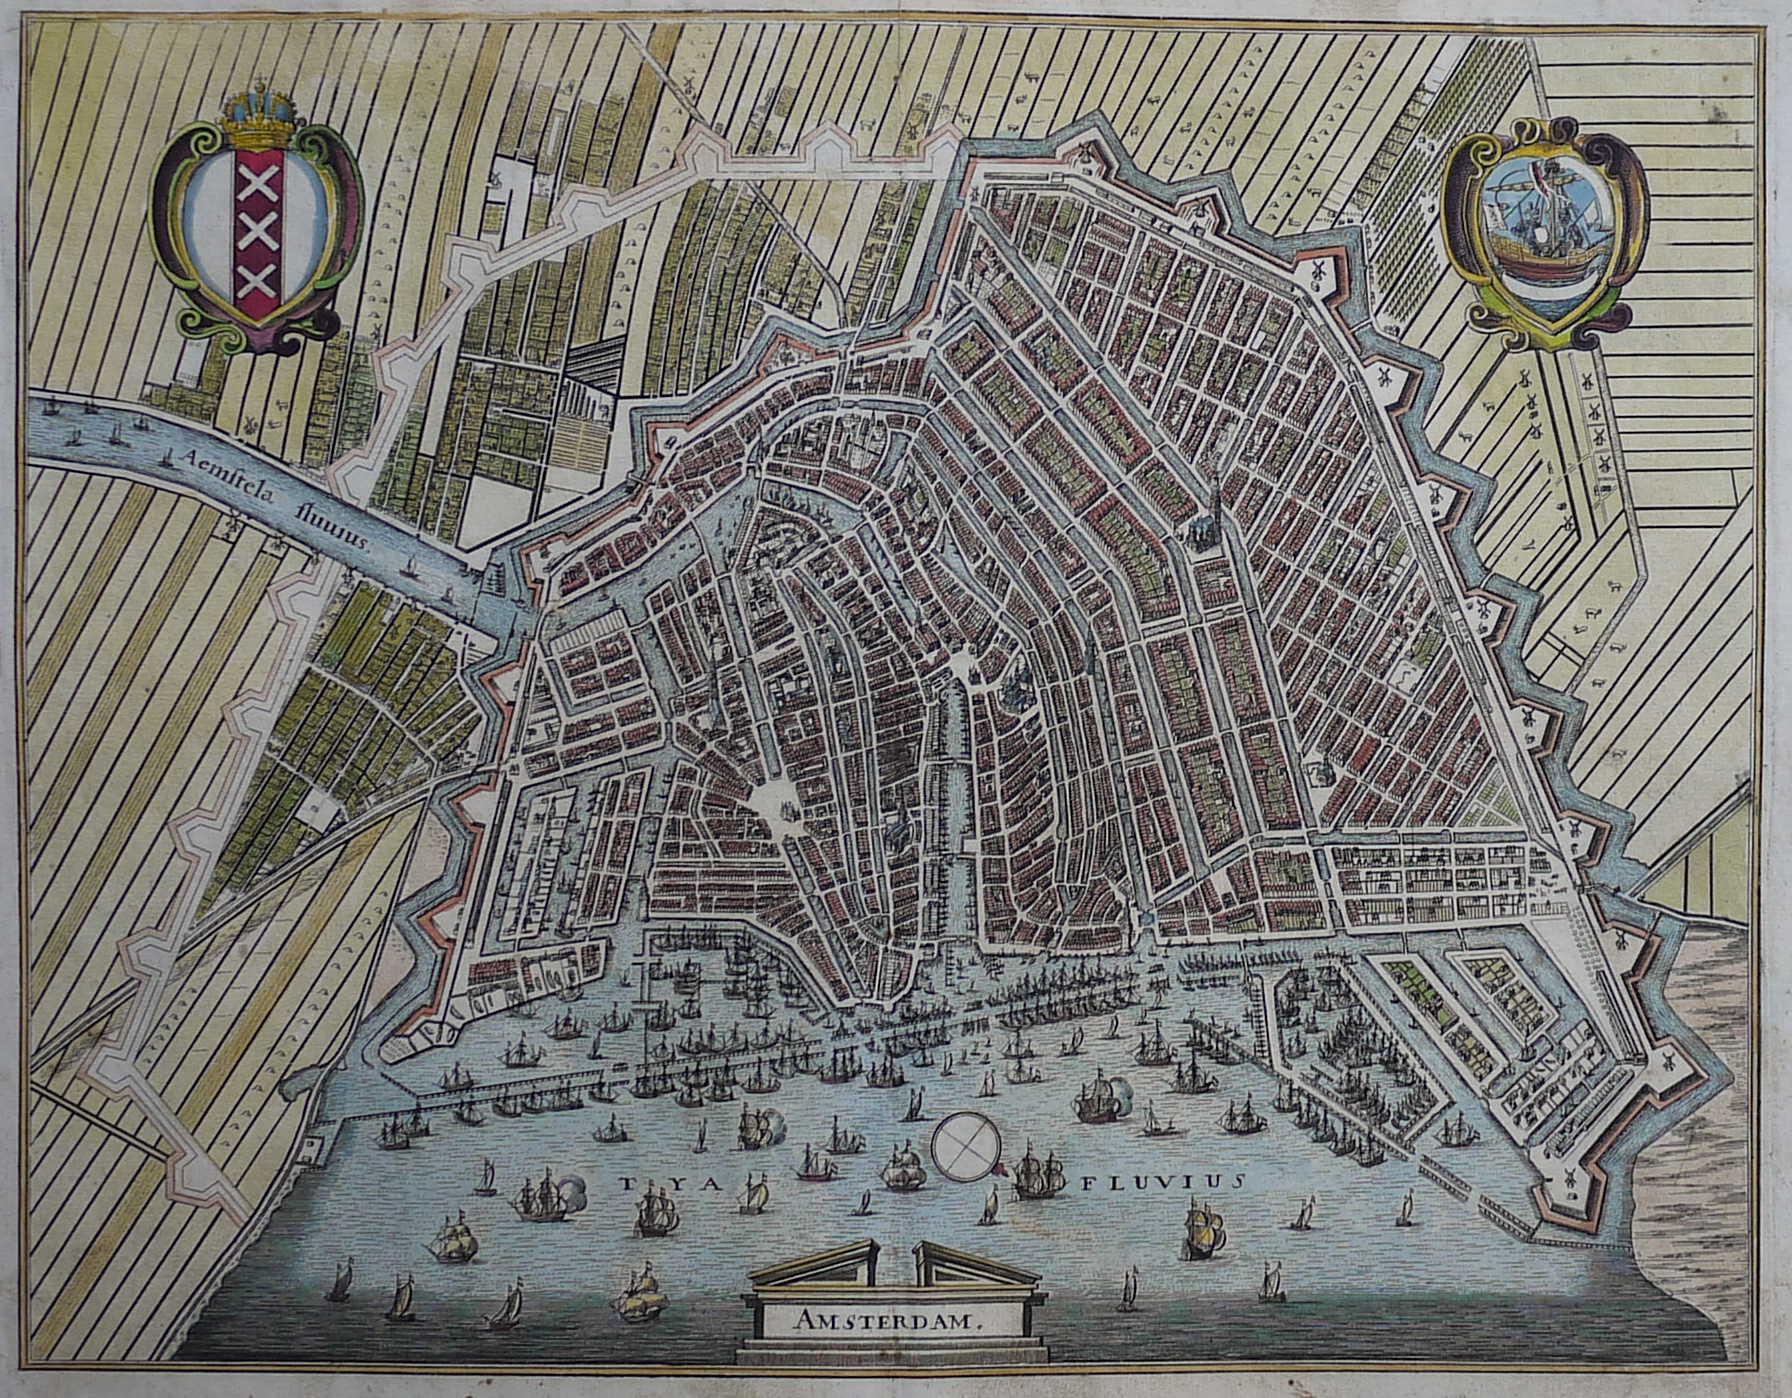 AMSTERDAM MERIAN Michael Jennings Antique Maps And Prints - Antique maps amsterdam